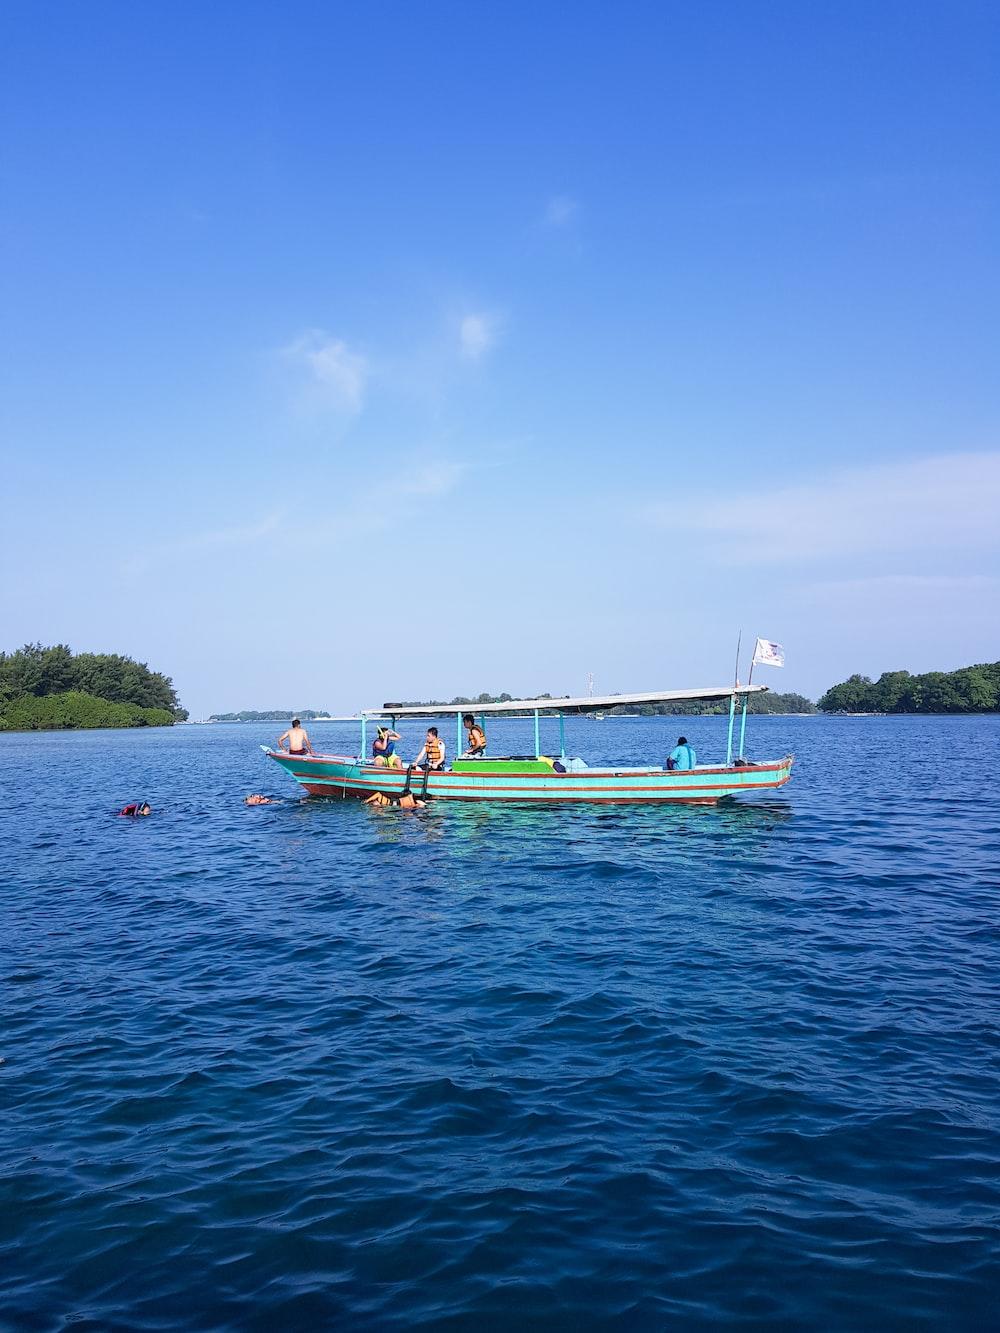 people swimming near boat